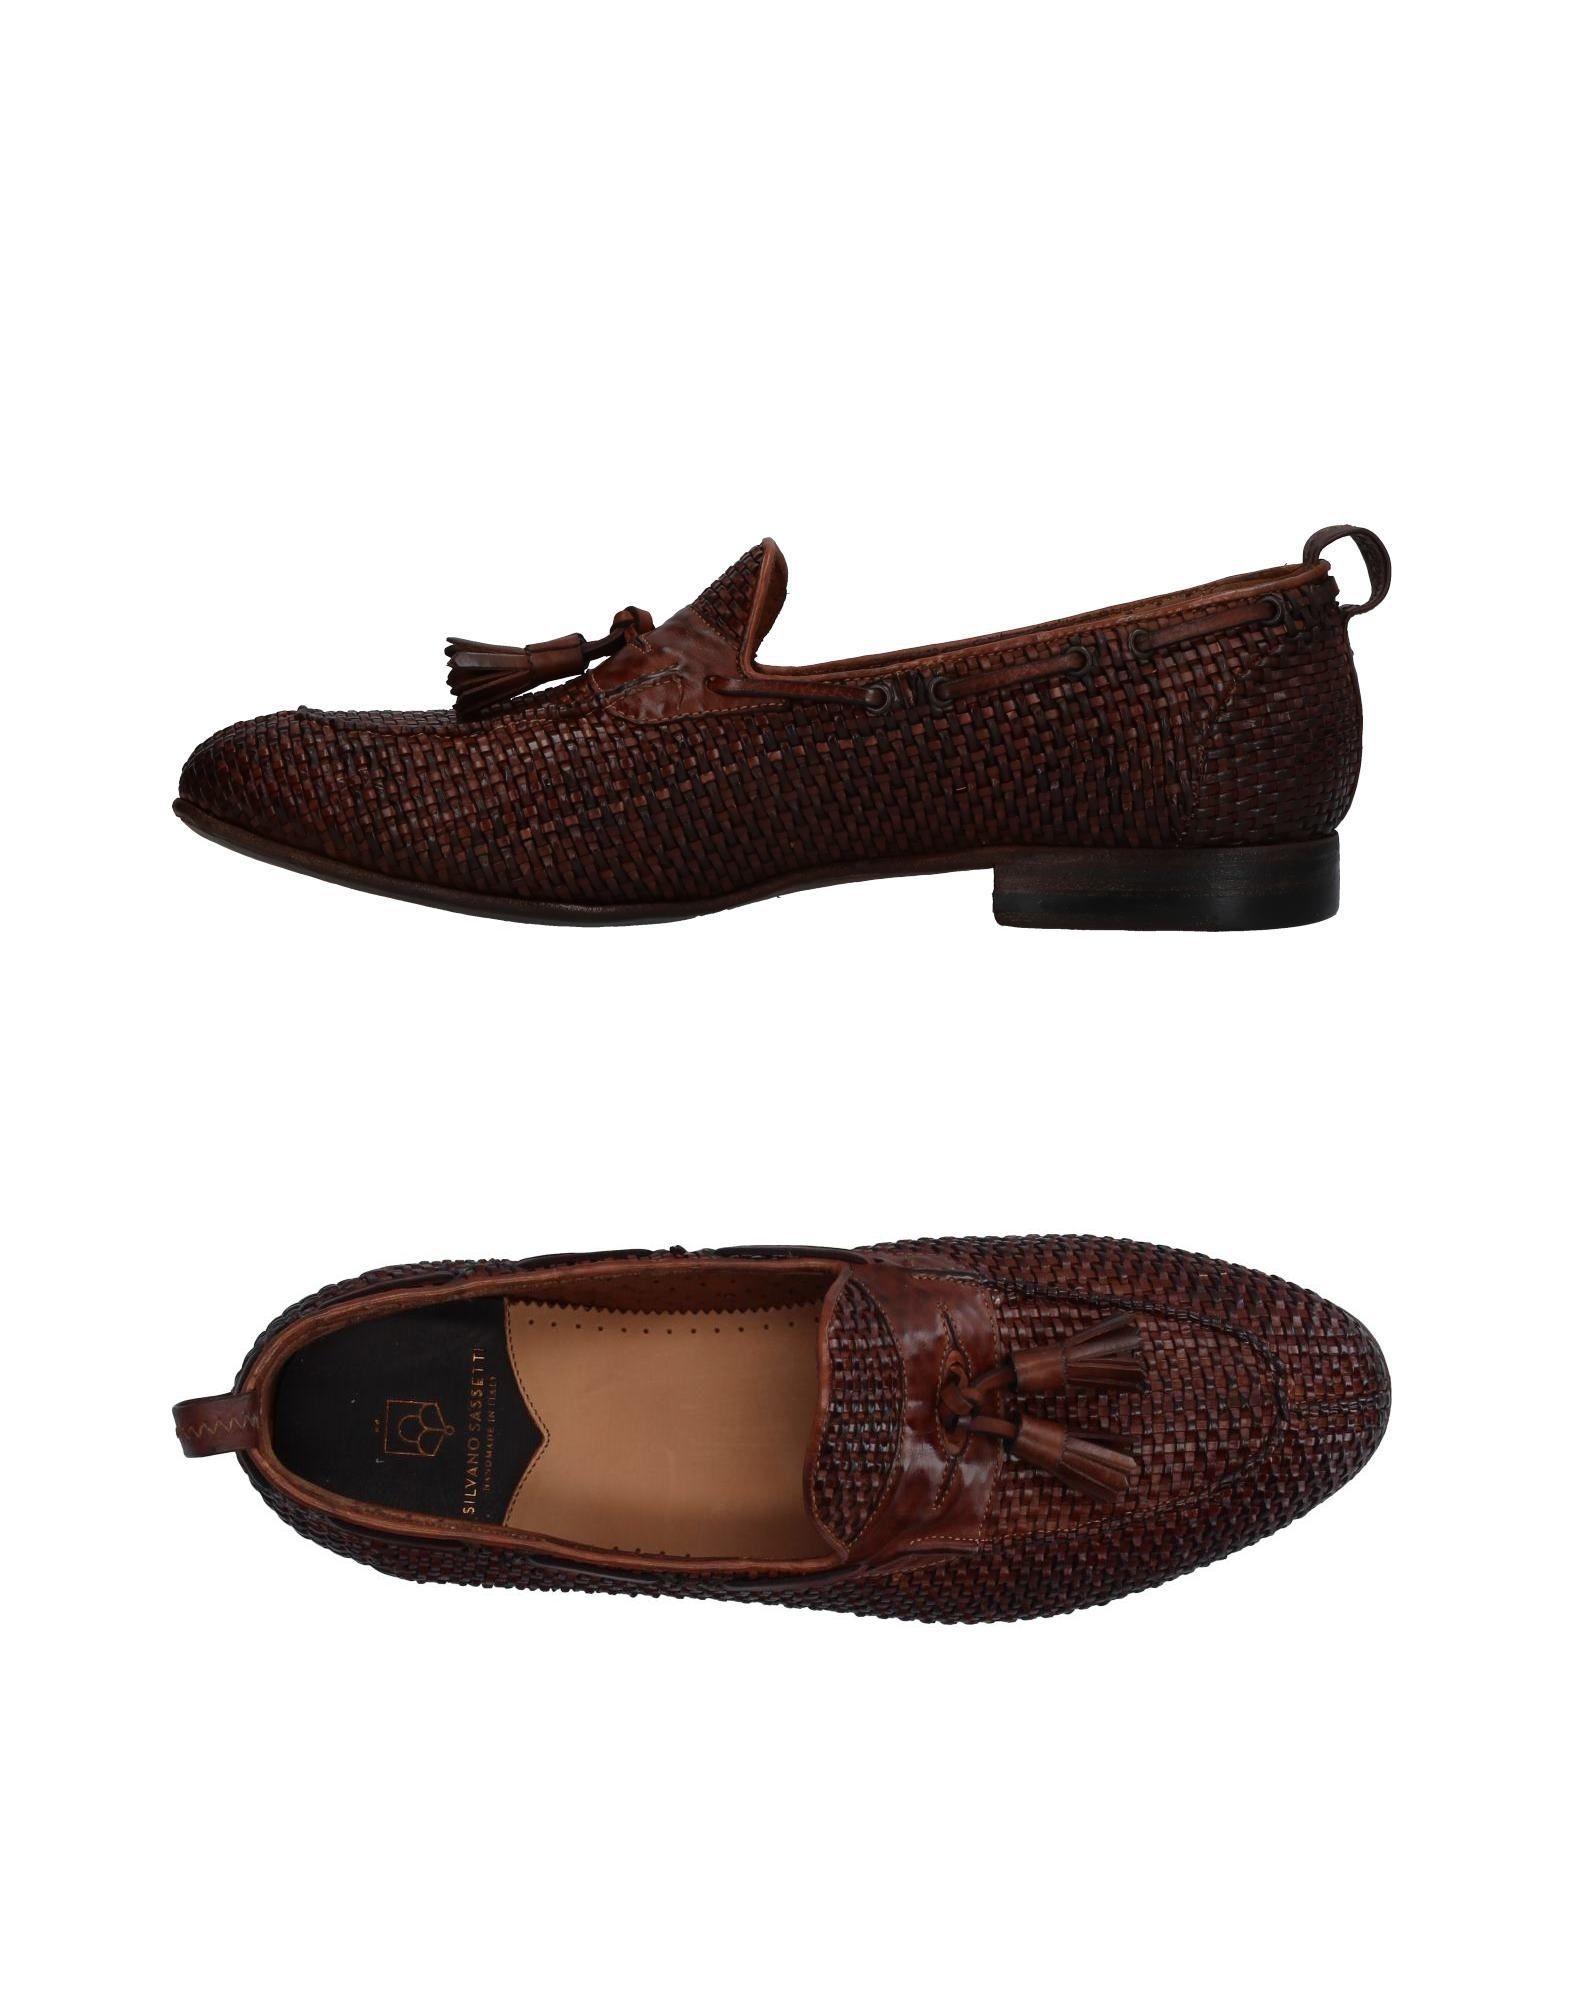 Silvano Sassetti Mokassins Herren  11364376EK Gute Qualität beliebte Schuhe